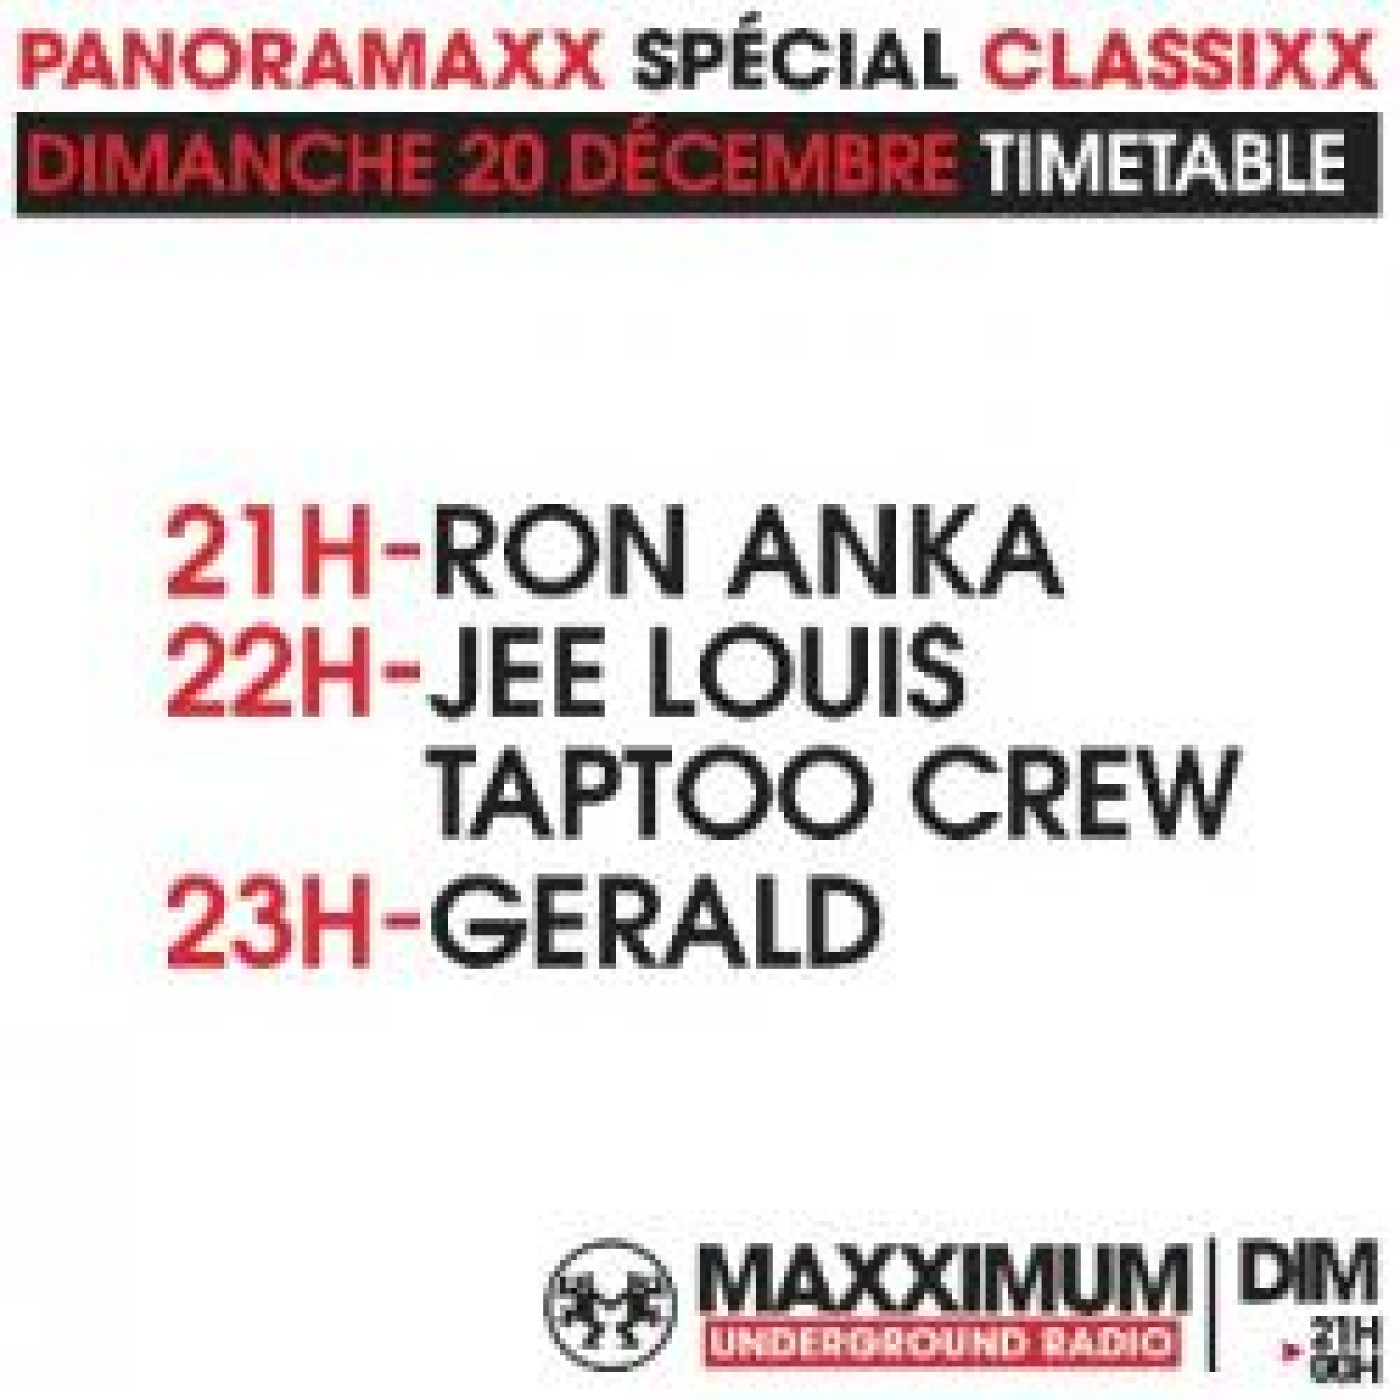 PANORAMAXX CLASSIXX : JEE LOUIS TAPTOO CREW